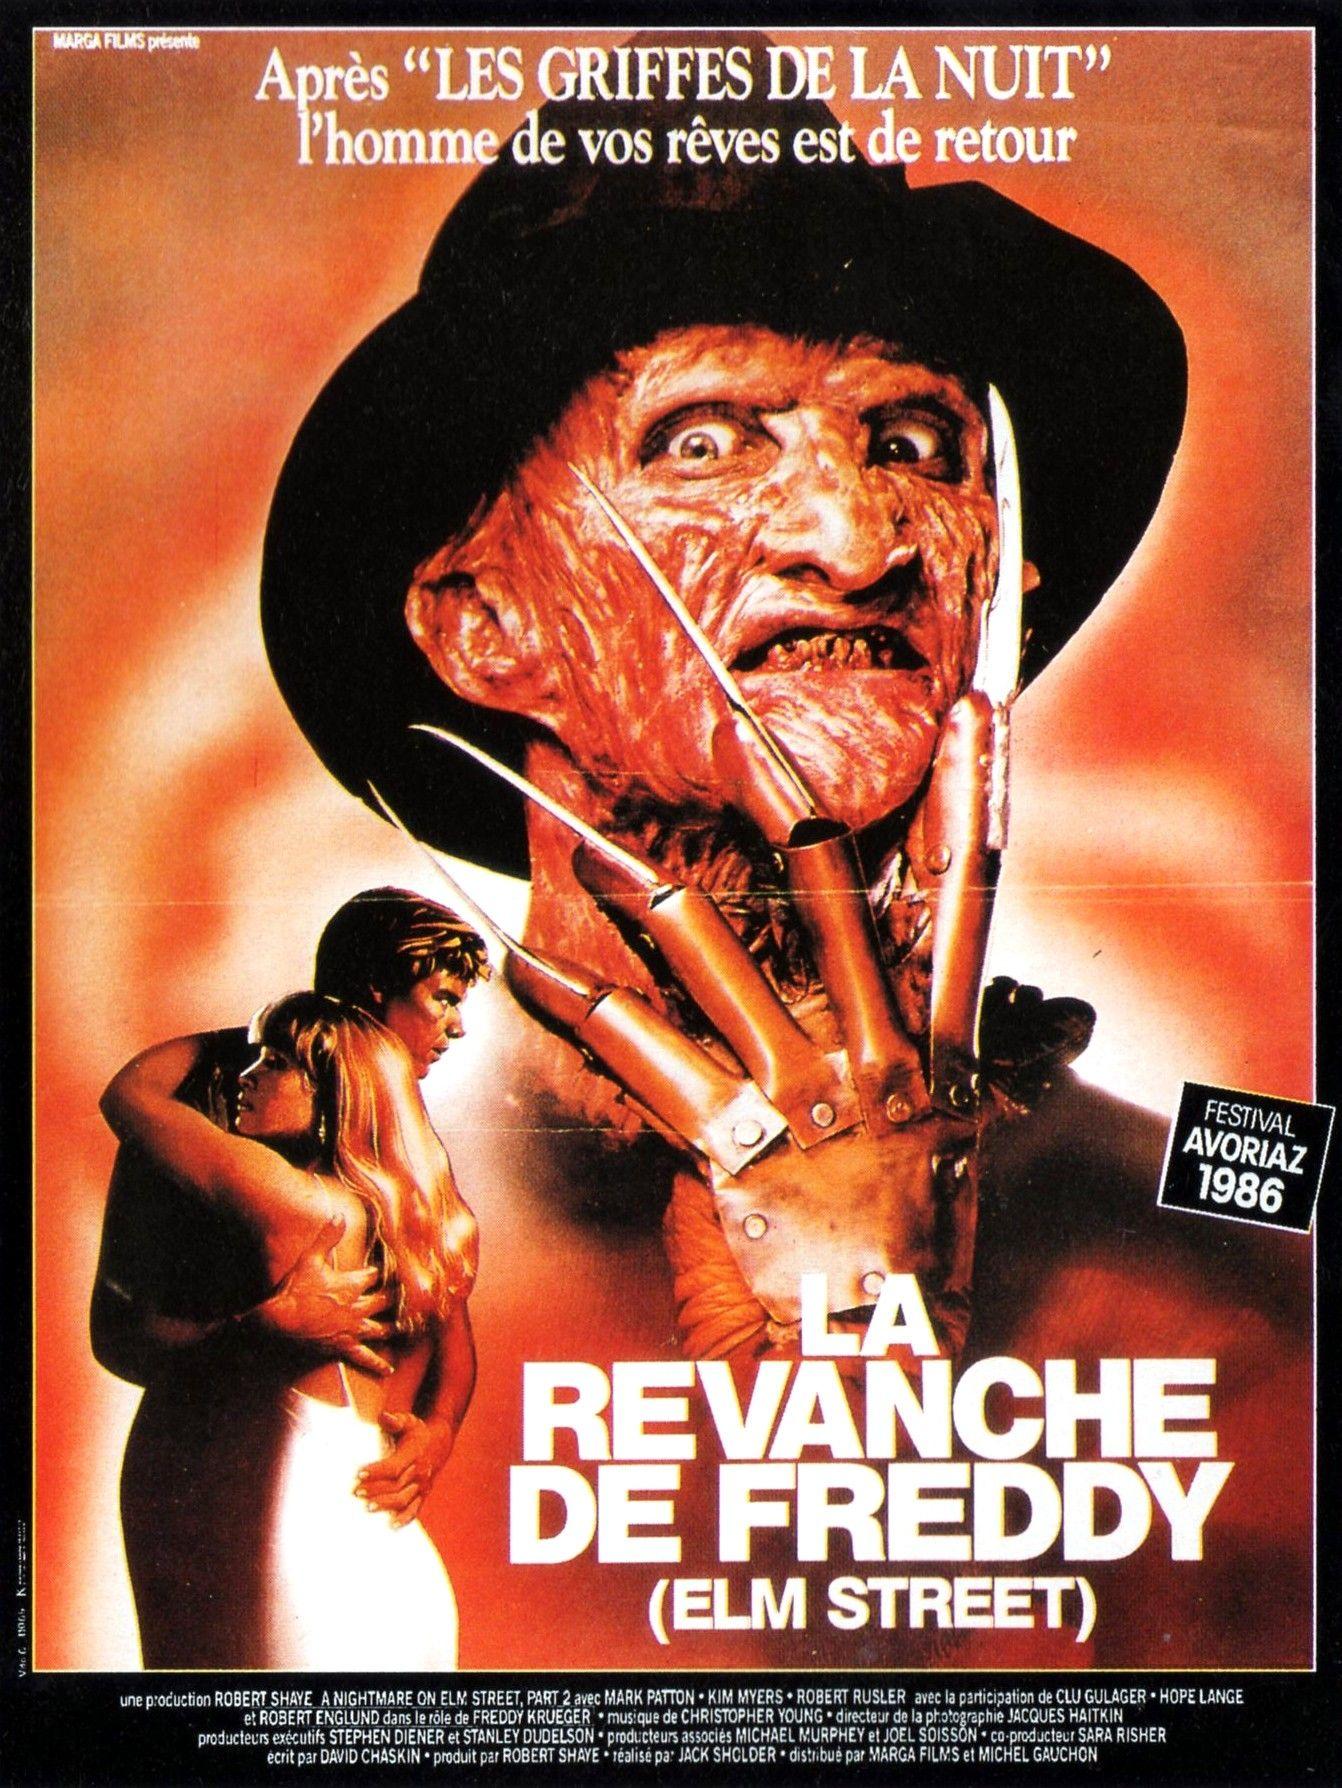 A Nightmare On Elm Street 2 Freddy S Revenge 1985 Nightmare On Elm Street Freddy S Revenge A Nightmare On Elm Street